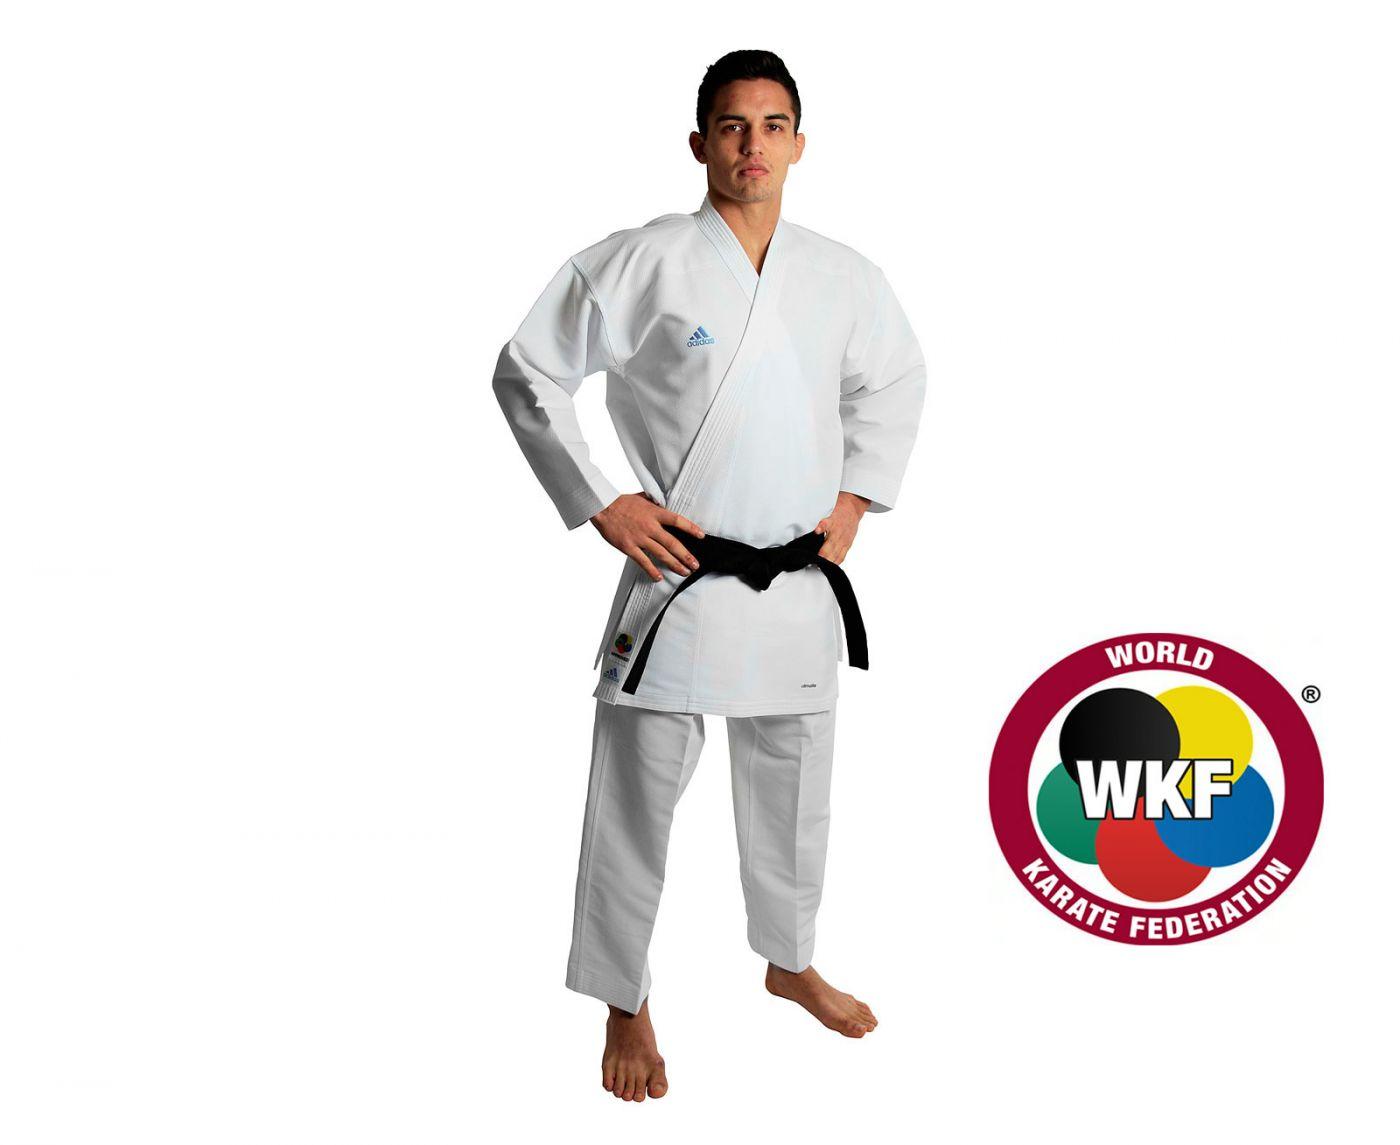 Кимоно для карате Adidas Revo Flex Karate Gi WKF белое, размер 185 см, артикул K190SK